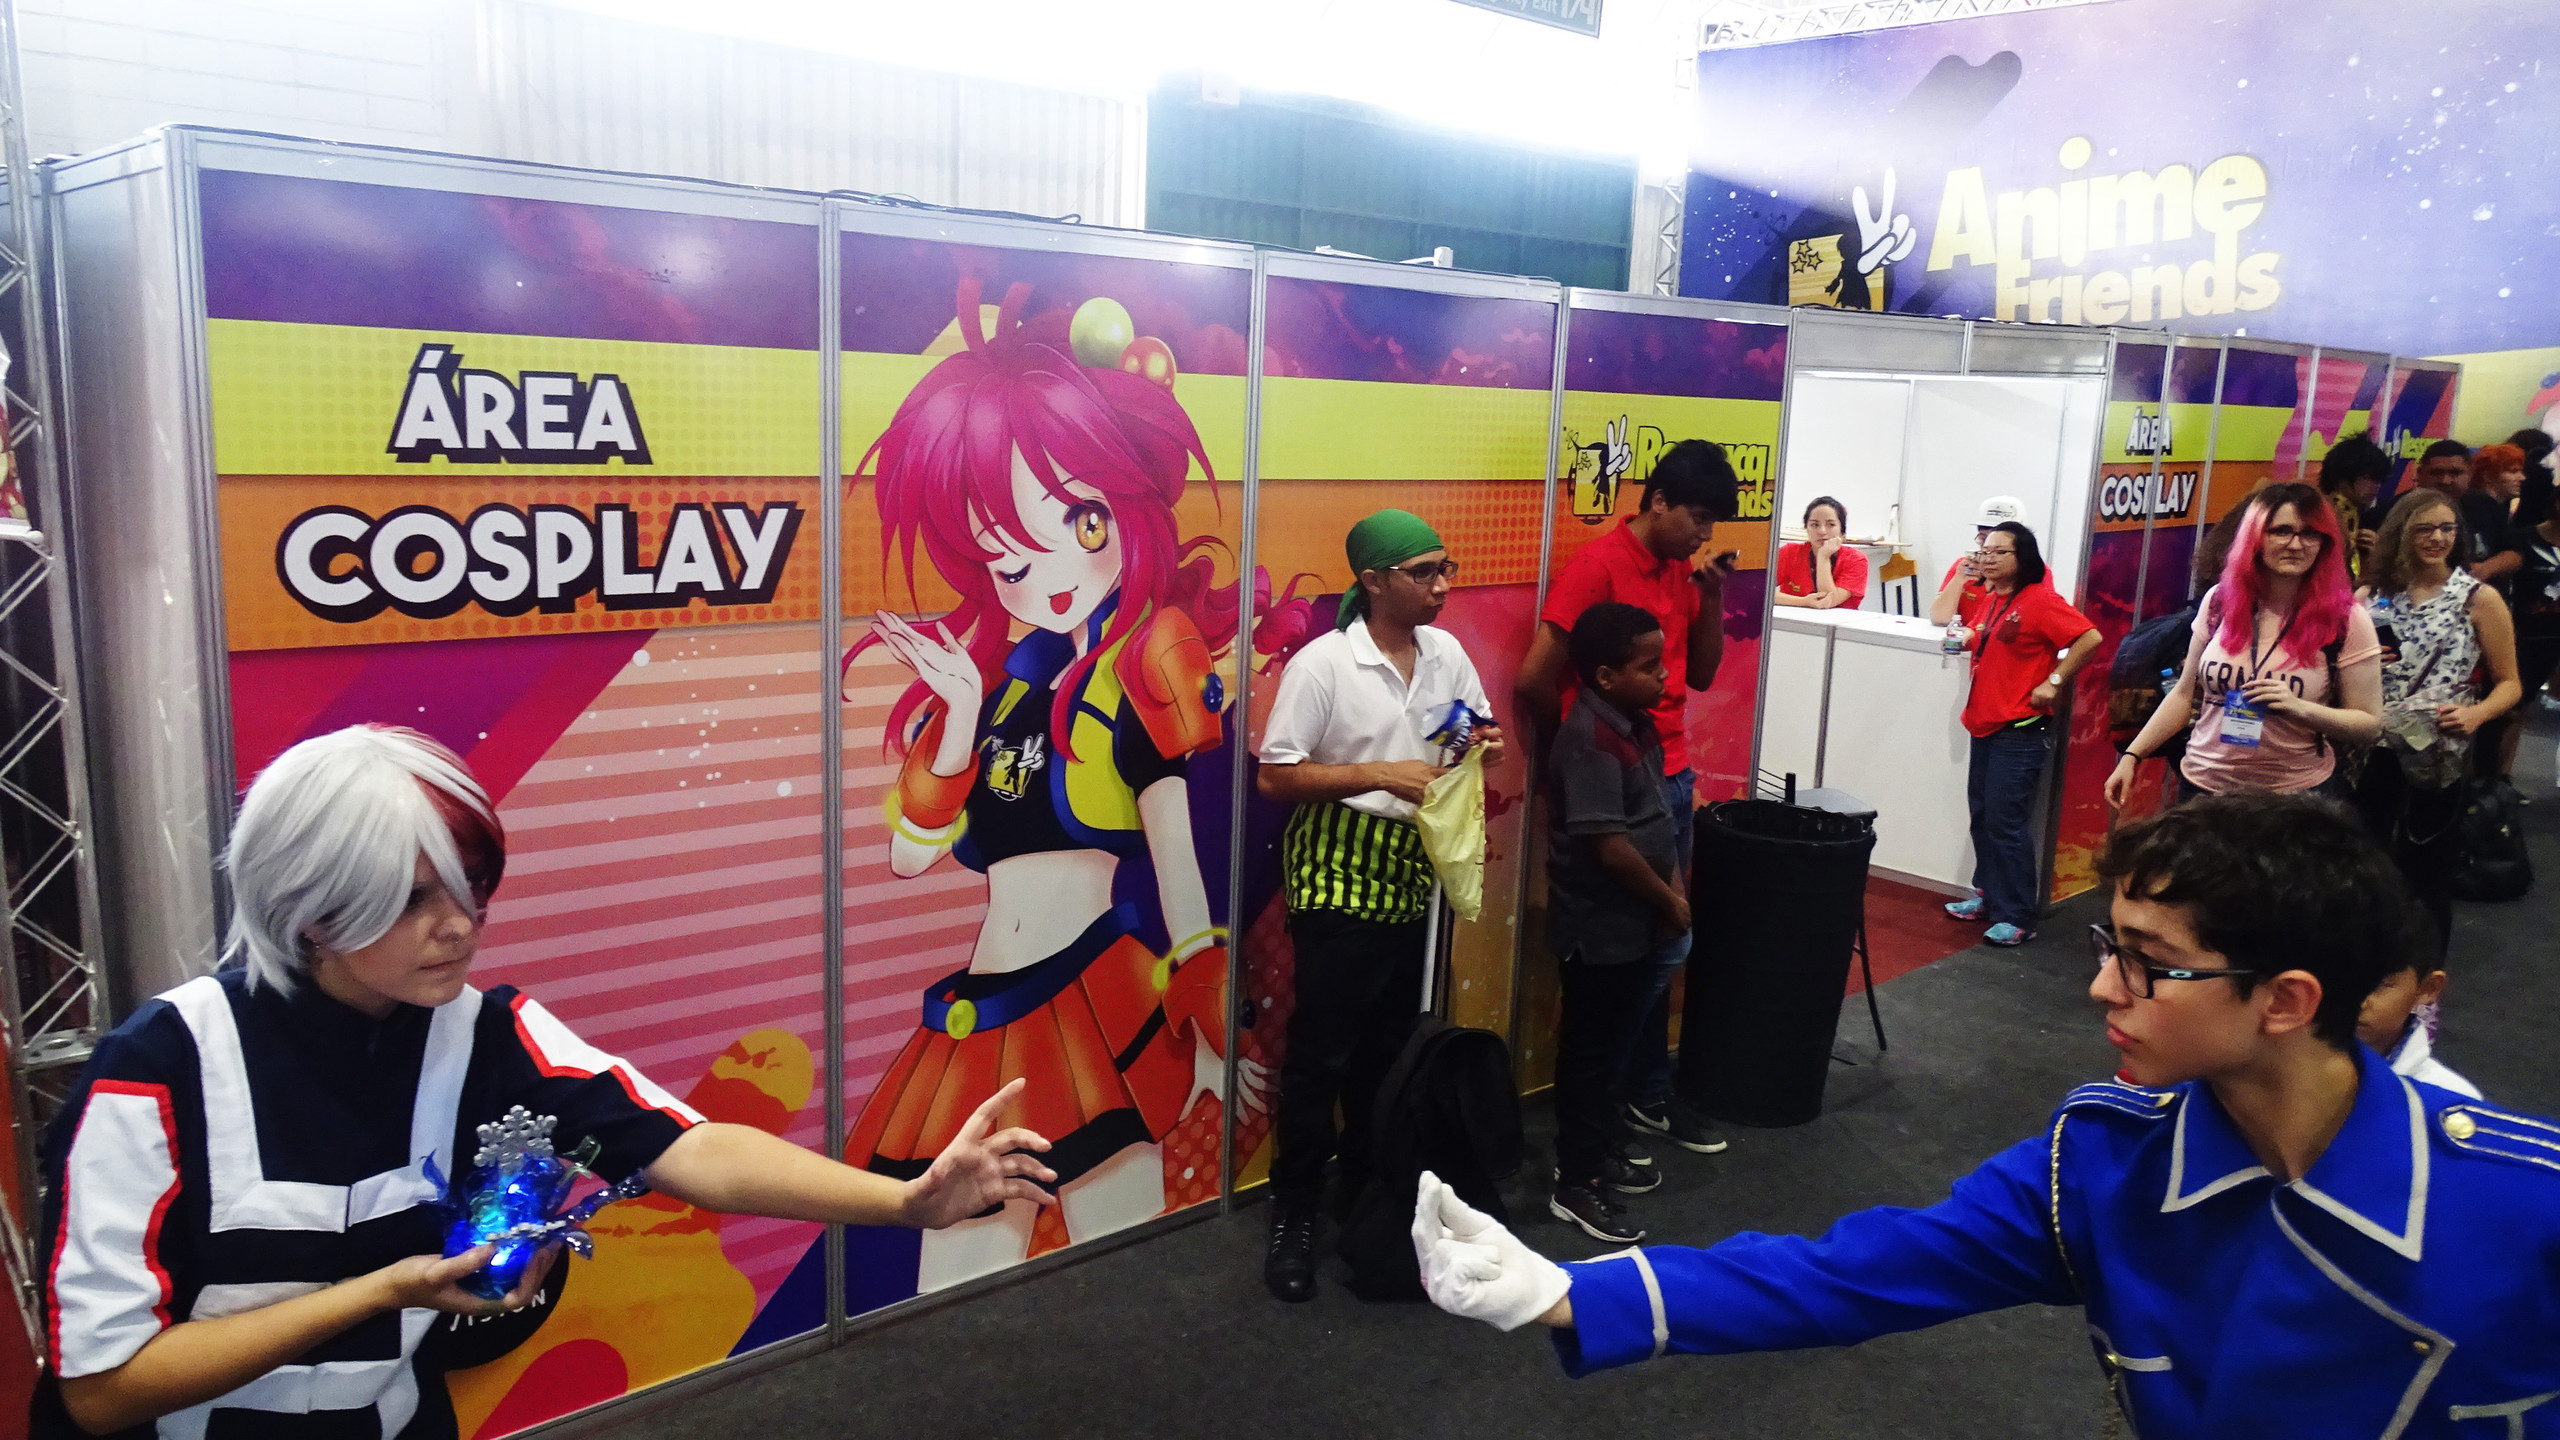 Área cosplay